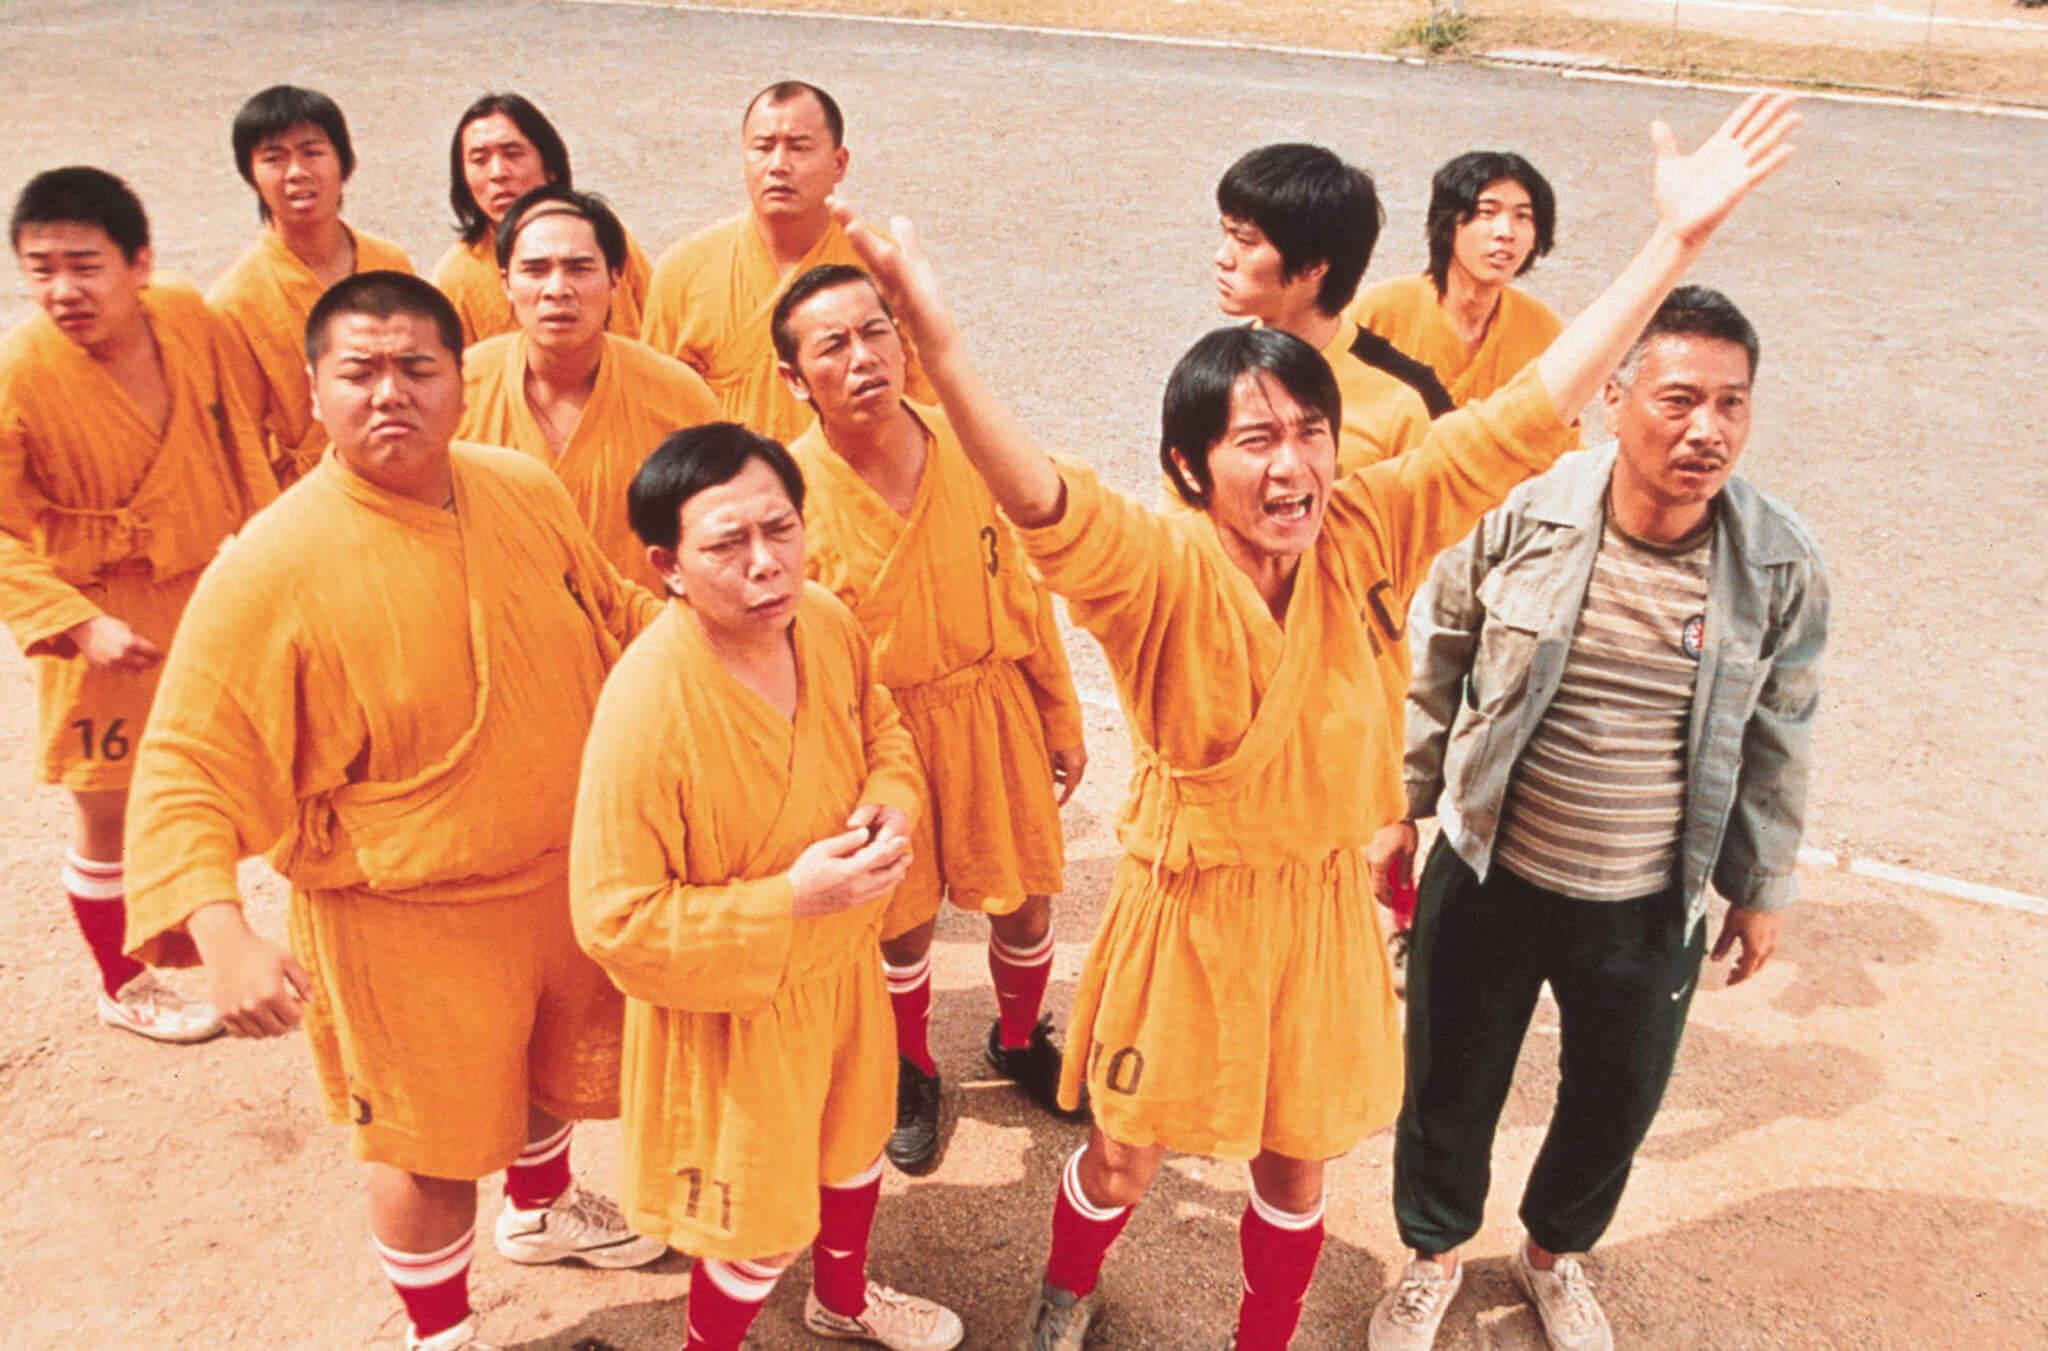 GGK54Y SHAOLIN KICKERS / Shaolin Soccer Hongkong 2002 / Stephen Chow Szene Regie: Stephen Chow aka. Shaolin Soccer. Image shot 2003. Exact date unknown.